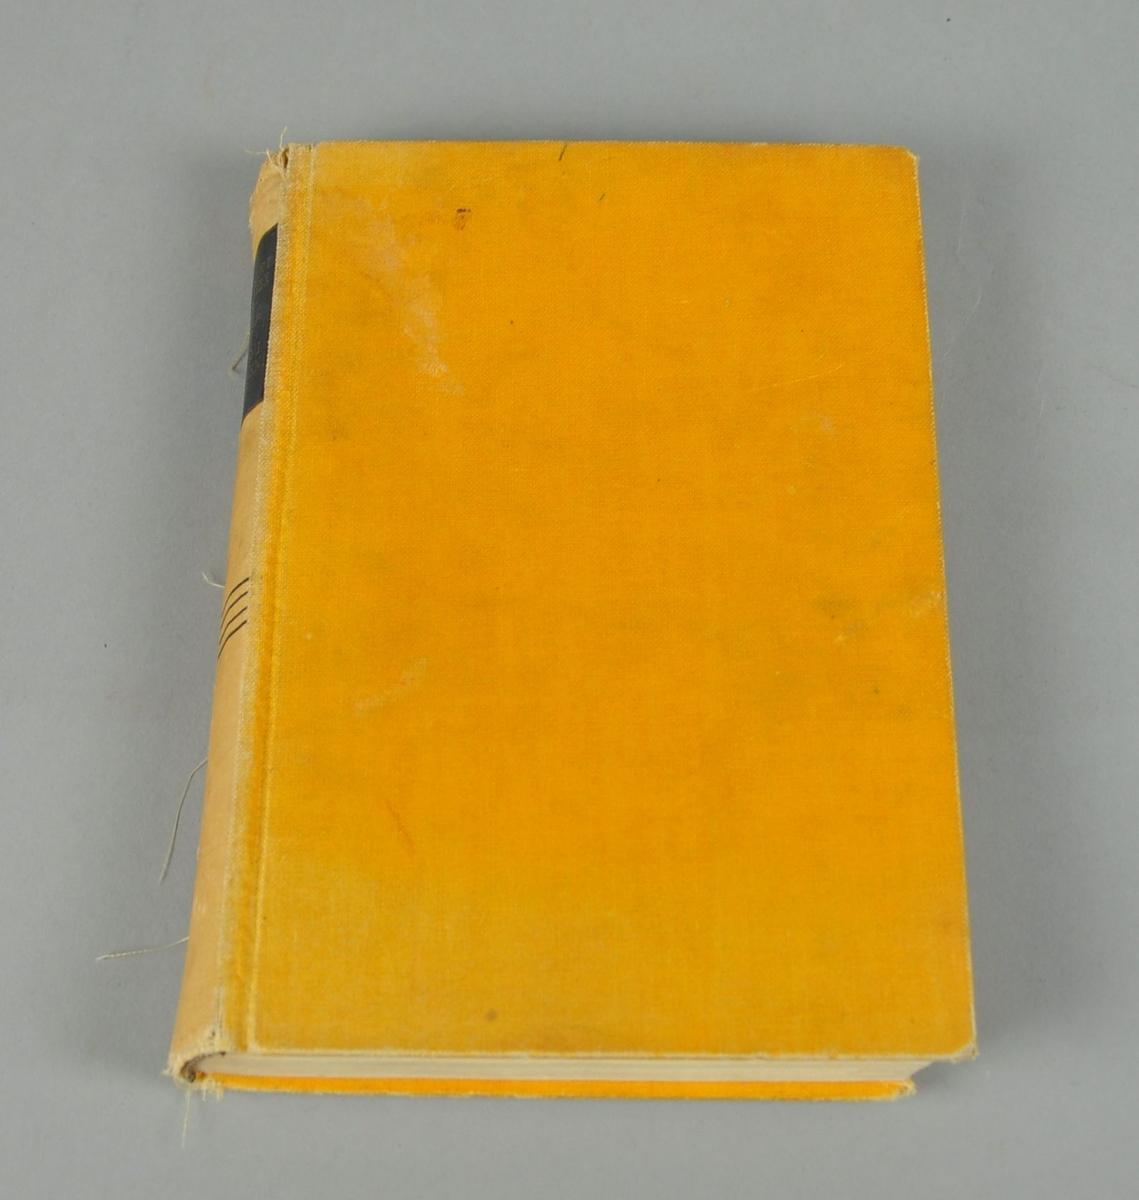 s. 219.